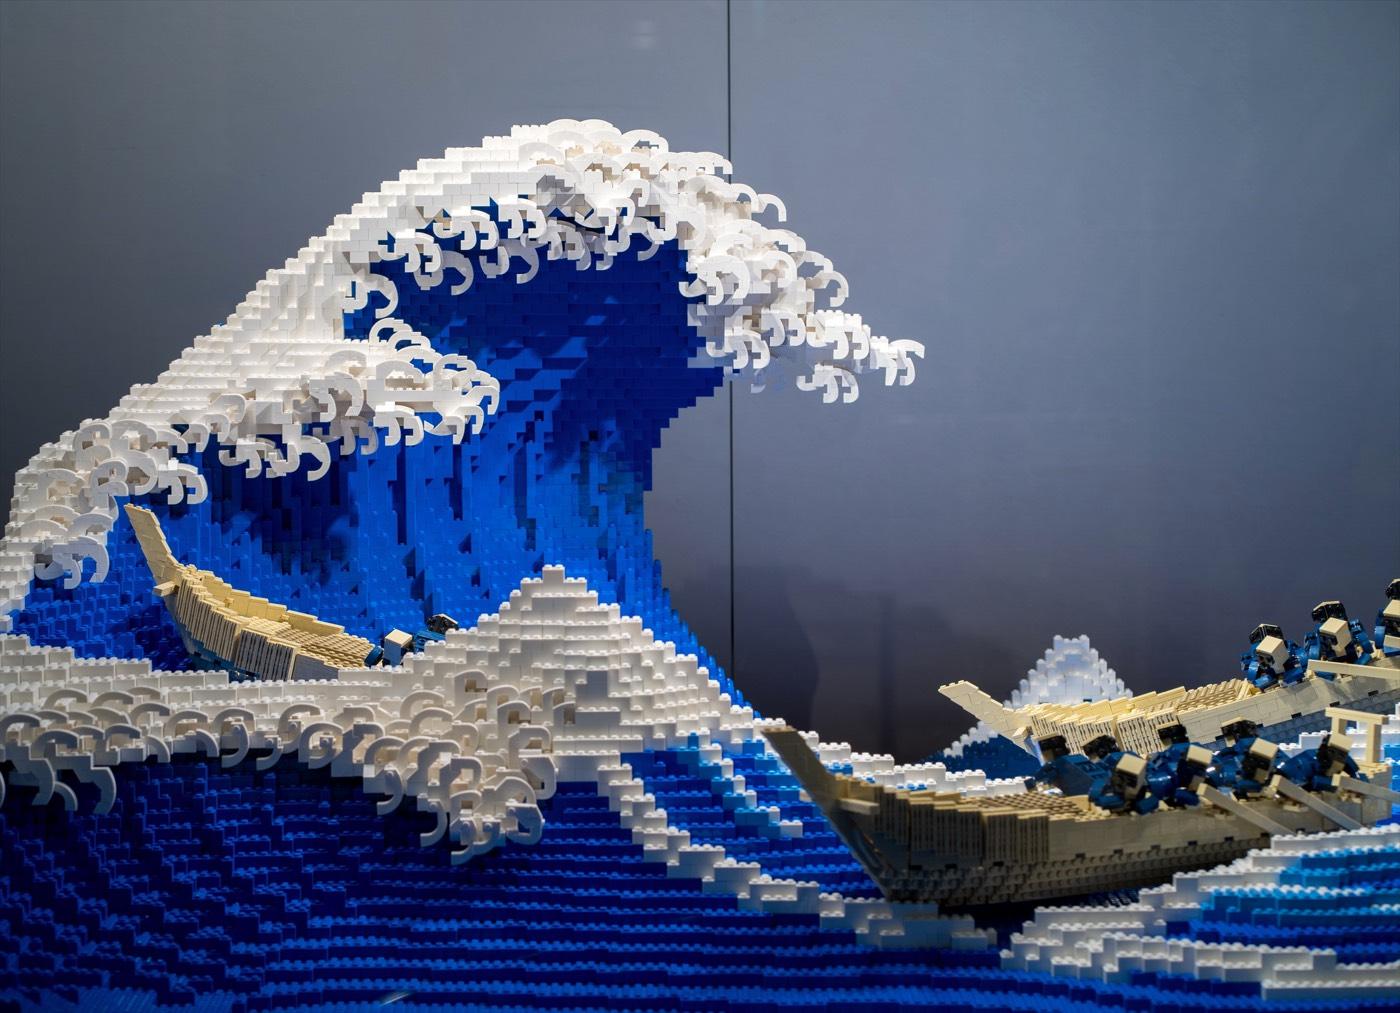 Lego Version of Hokusai's Iconic The Great Wave off Kanagawa